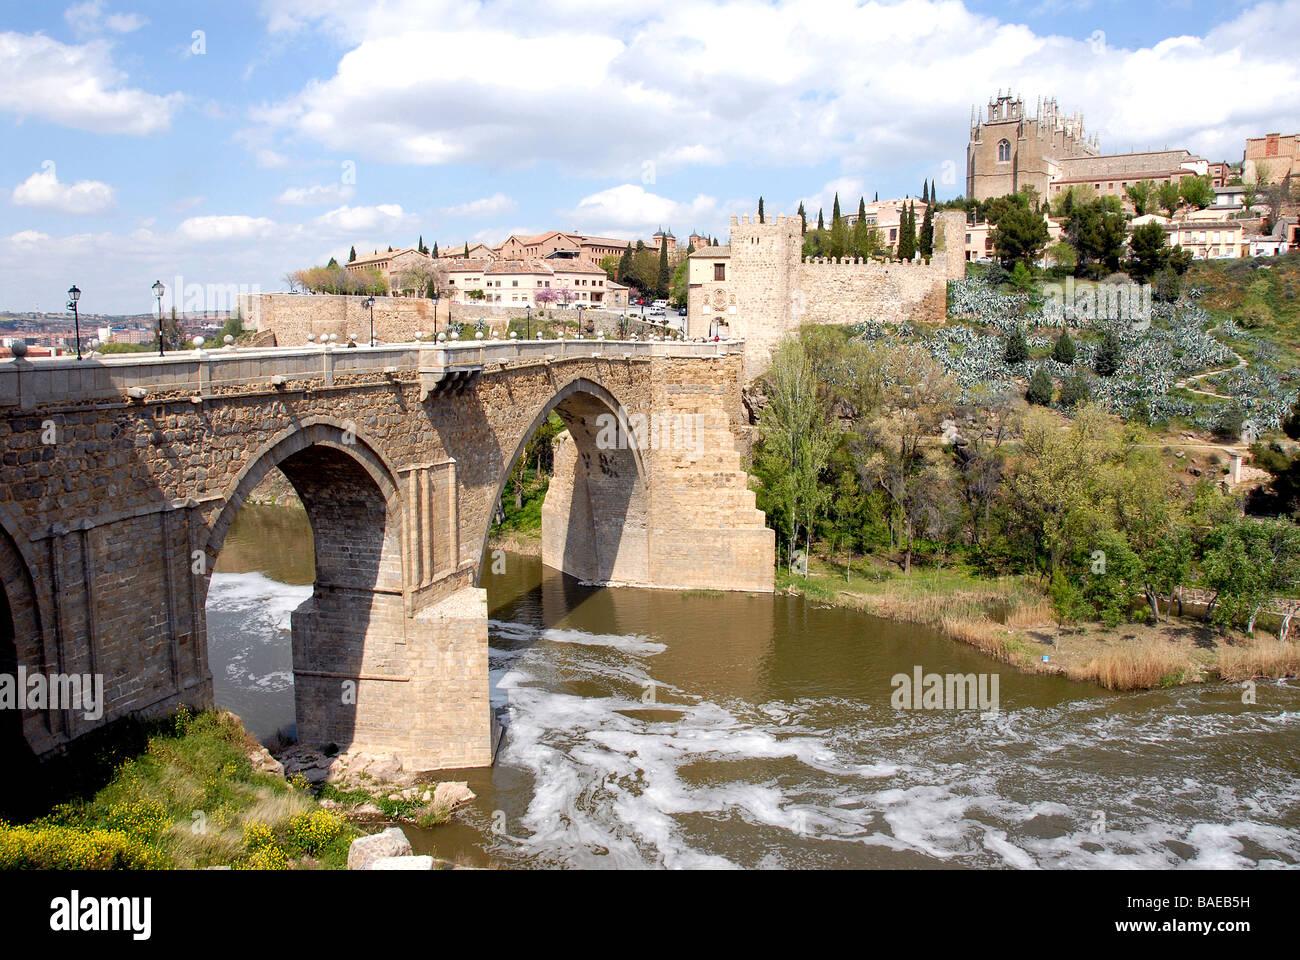 Cityscape, bridge on Tage, Toledo, Spain - Stock Image